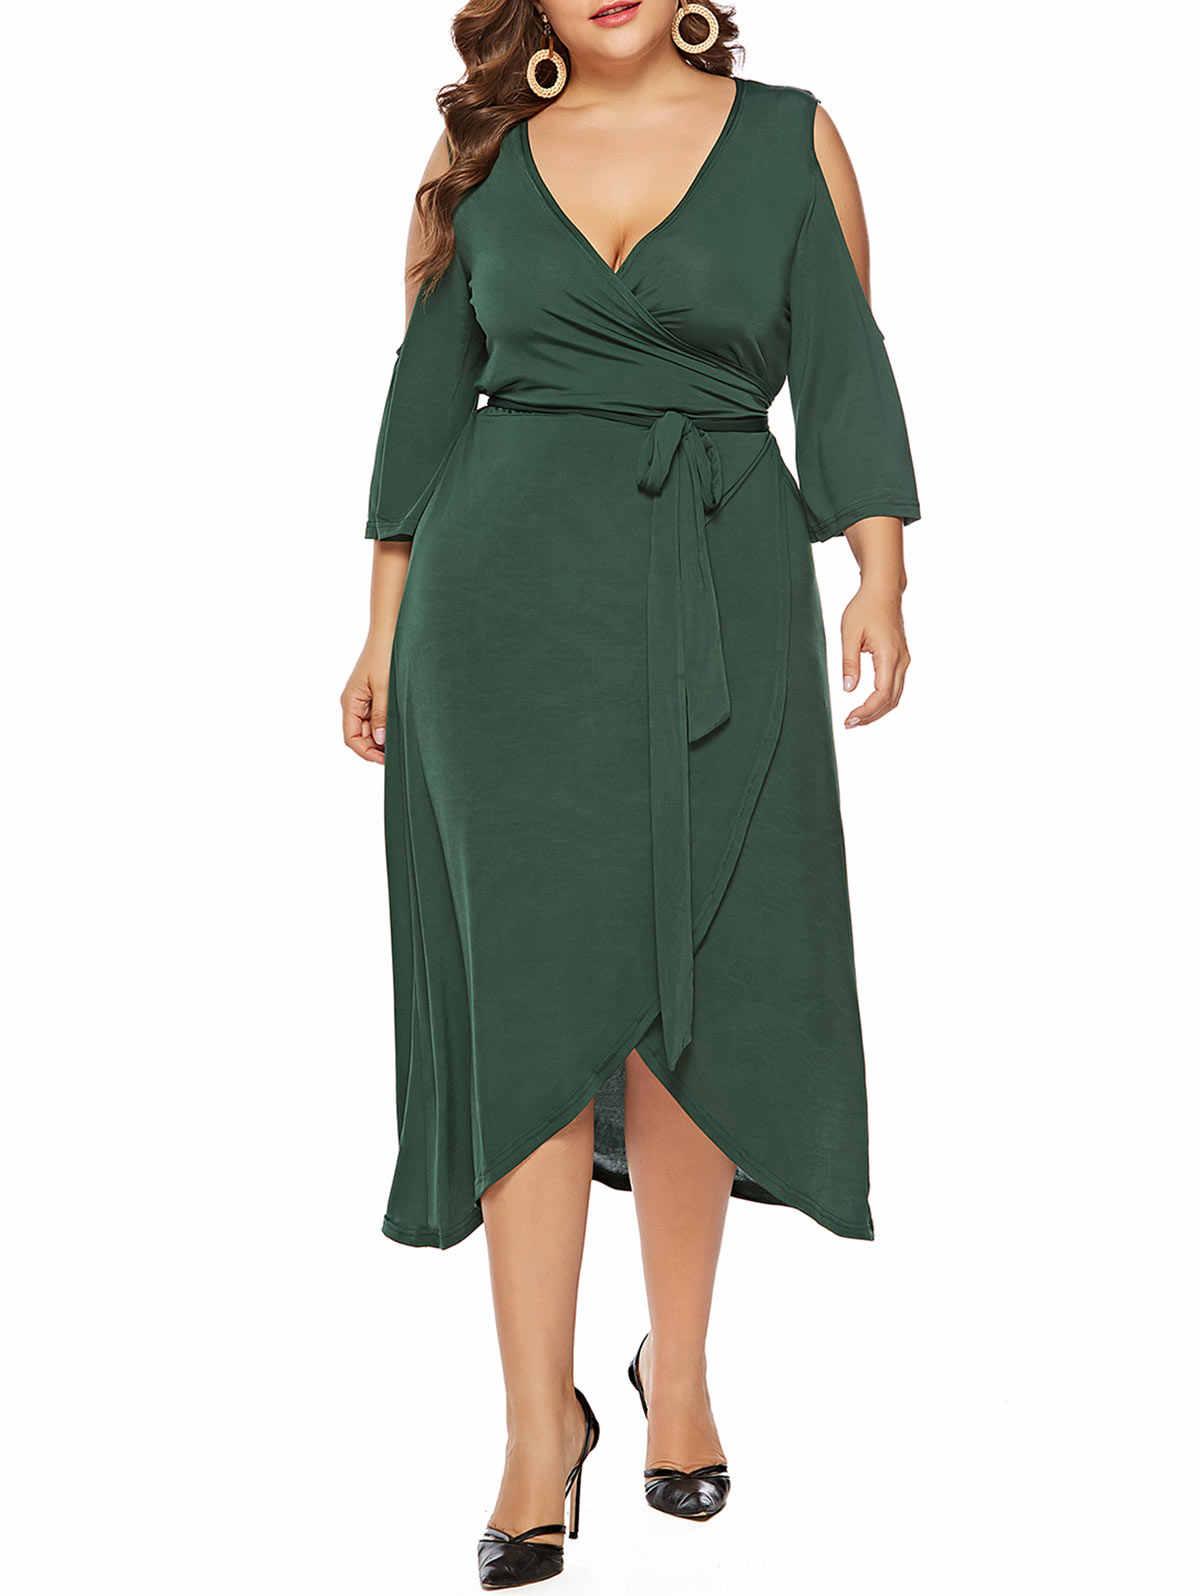 Wipalo Plus Size Cold Shoulder Wrap Women Dress 3 4 Sleeve Bowknot Cut Out  Asymmetrical ade33bad3e45